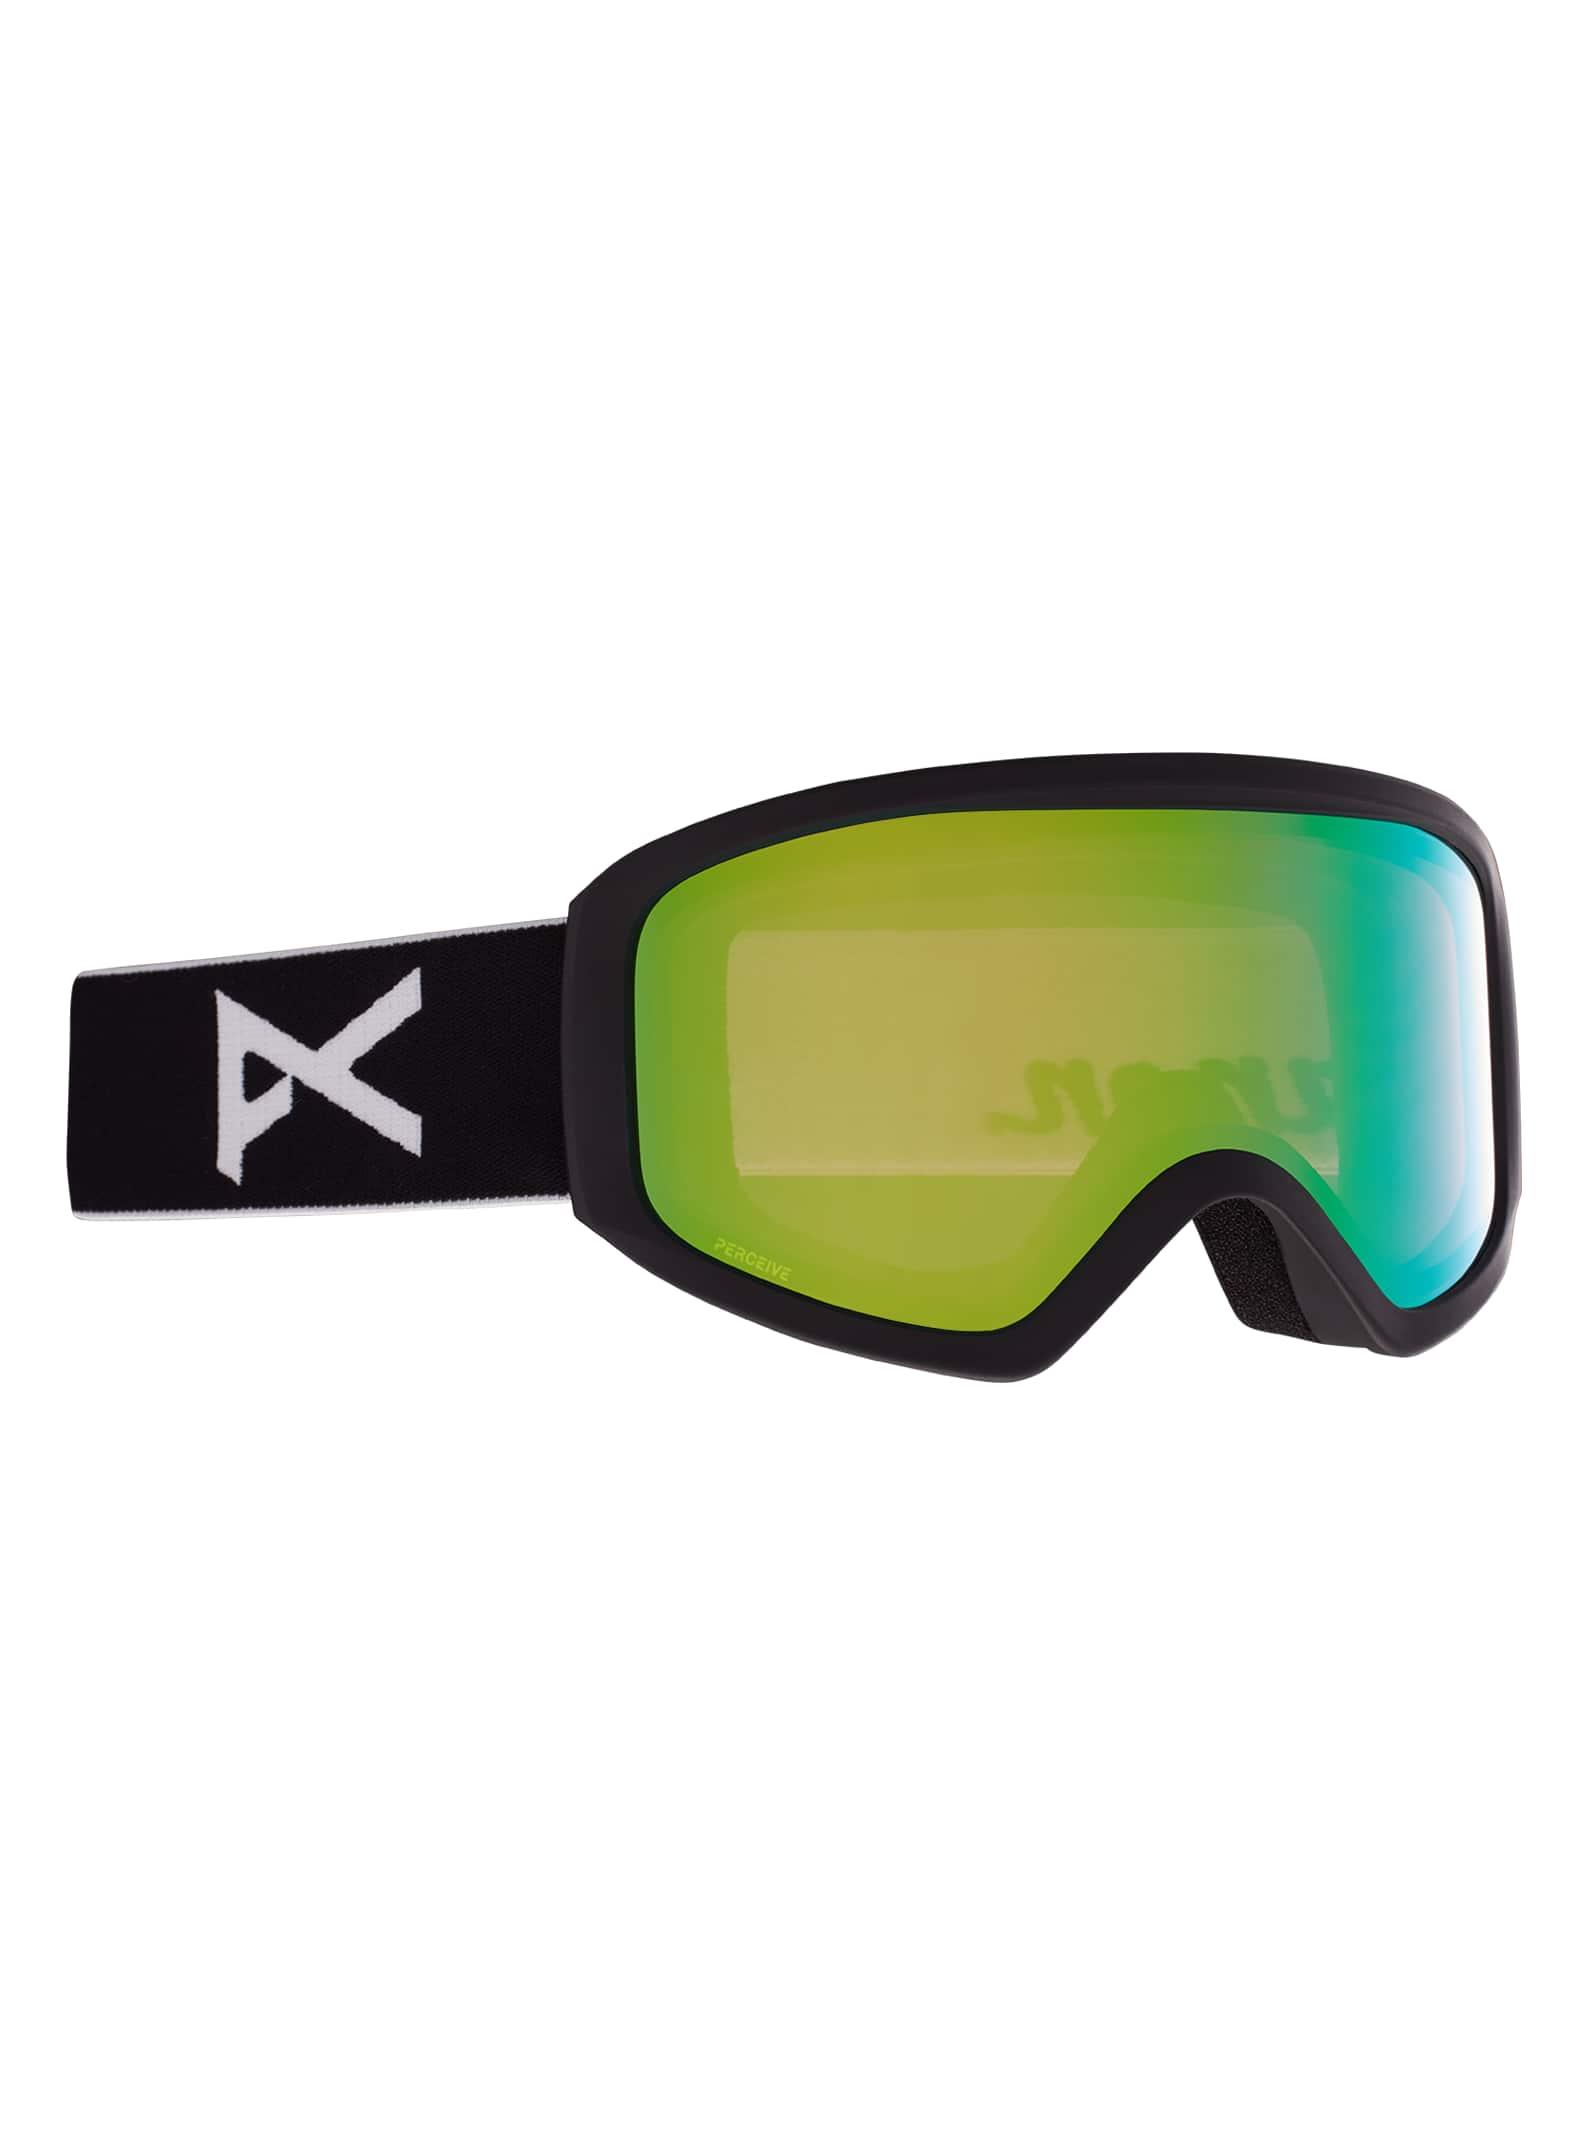 Anon Insight skidglasögon PERCEIVE + reservlins